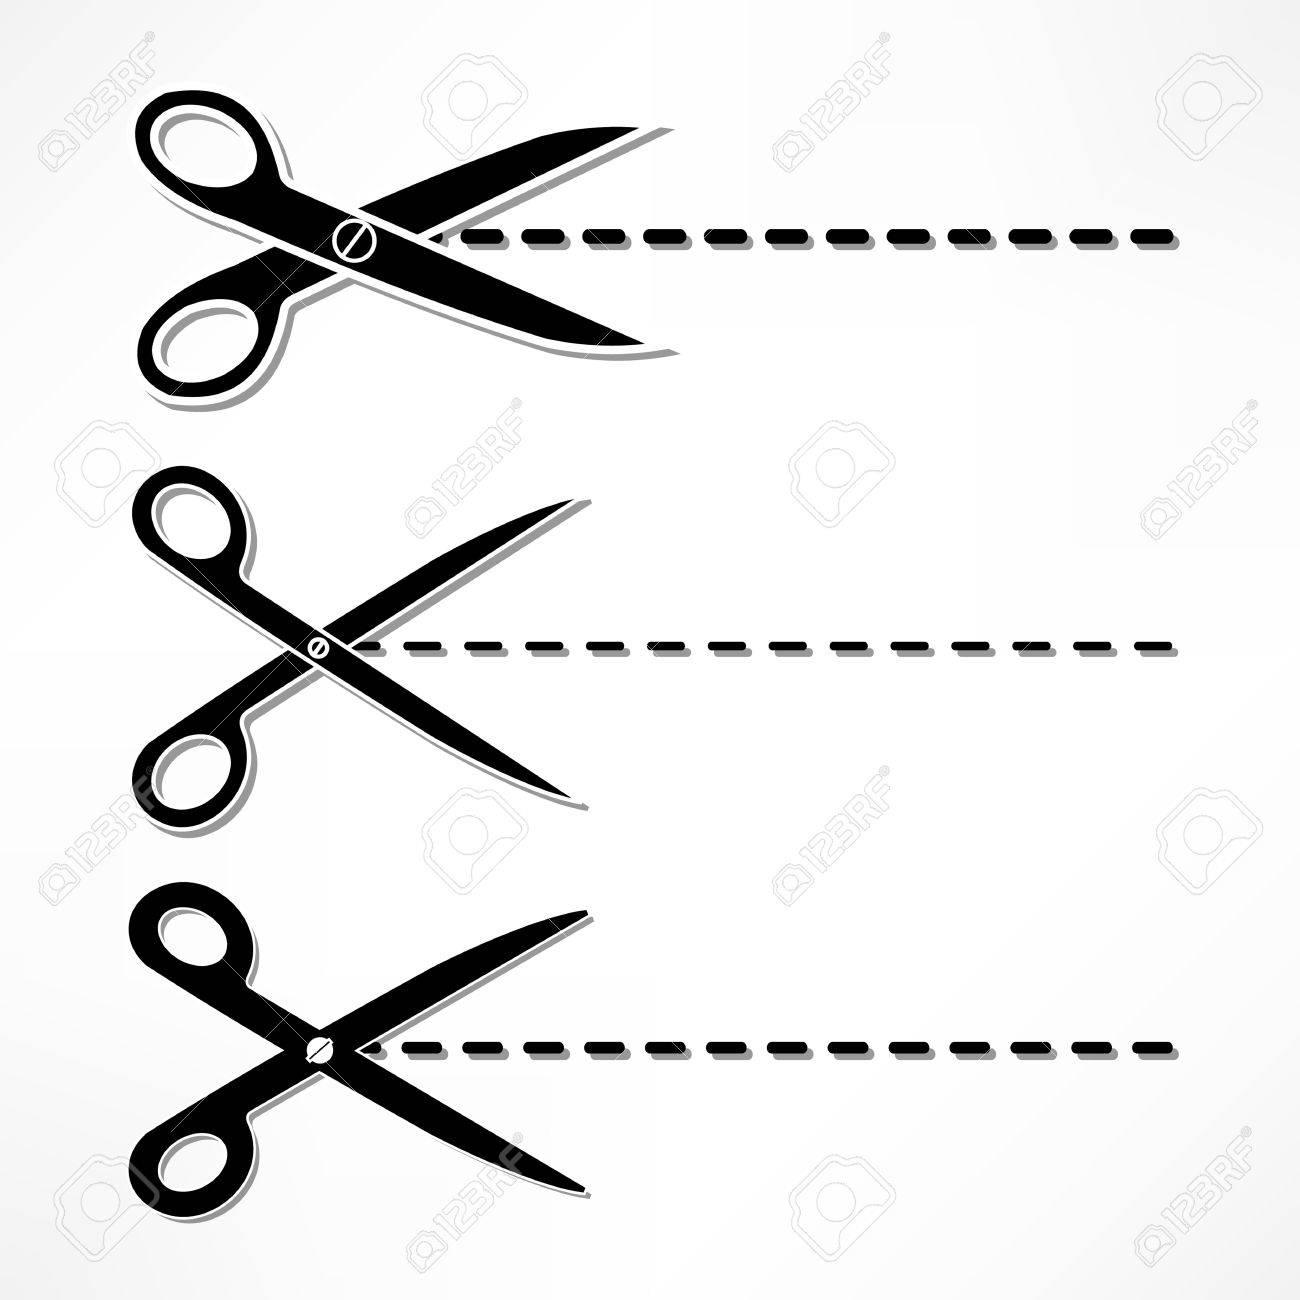 scissors cut lines Stock Vector - 14305204